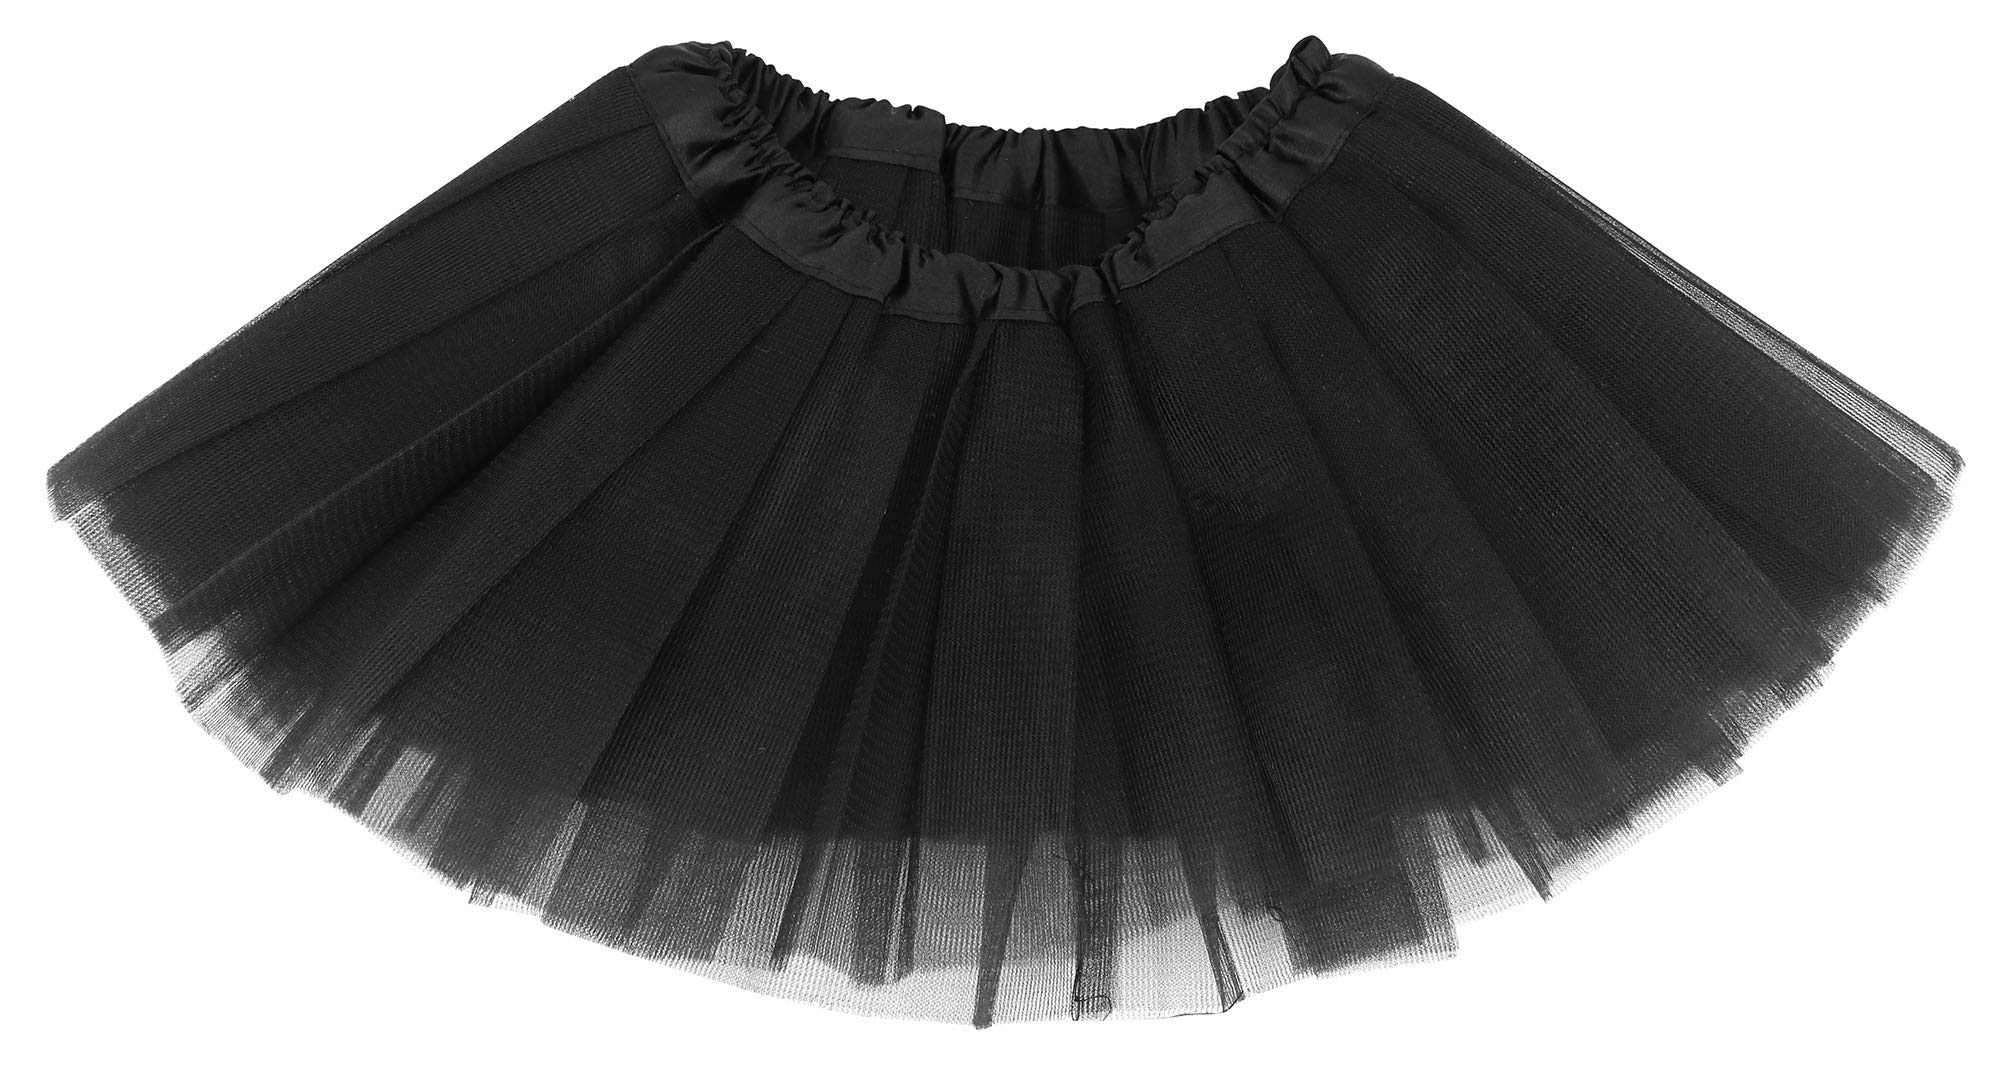 Baby Girl's 4 Layered Tulle Classic Princess Ballet Costume Dress-up Tutu Skirt